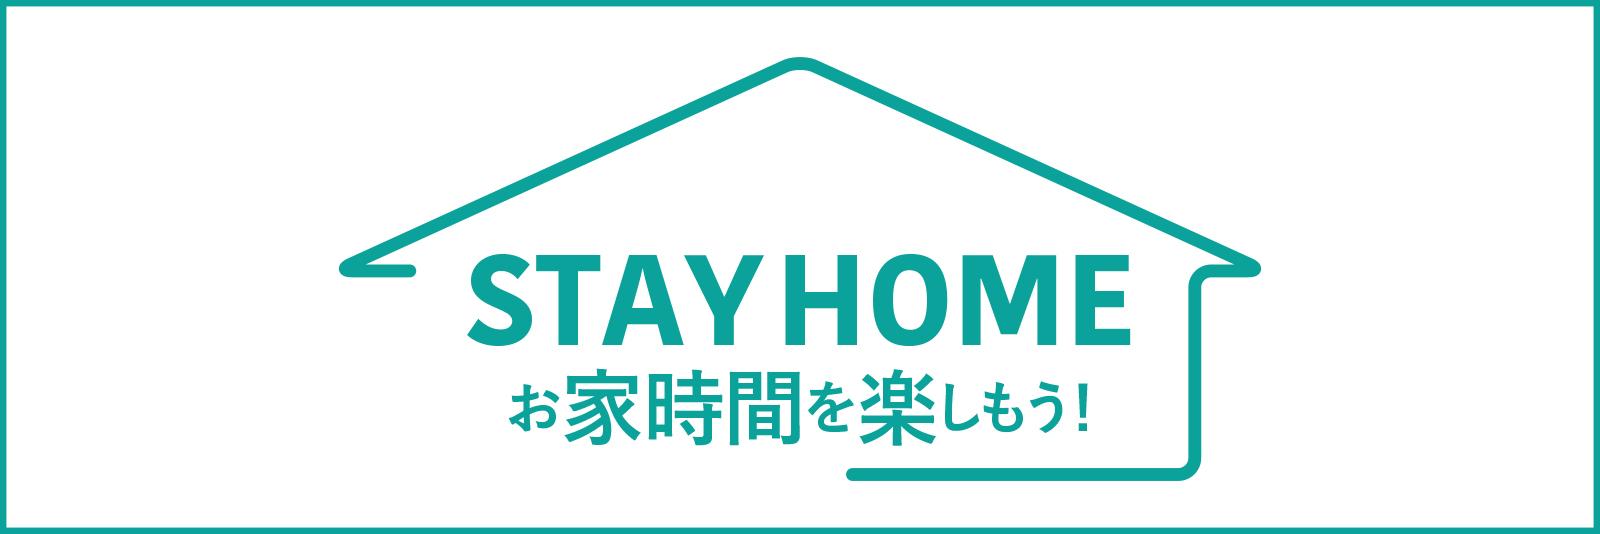 top_stayhome_banner.jpg